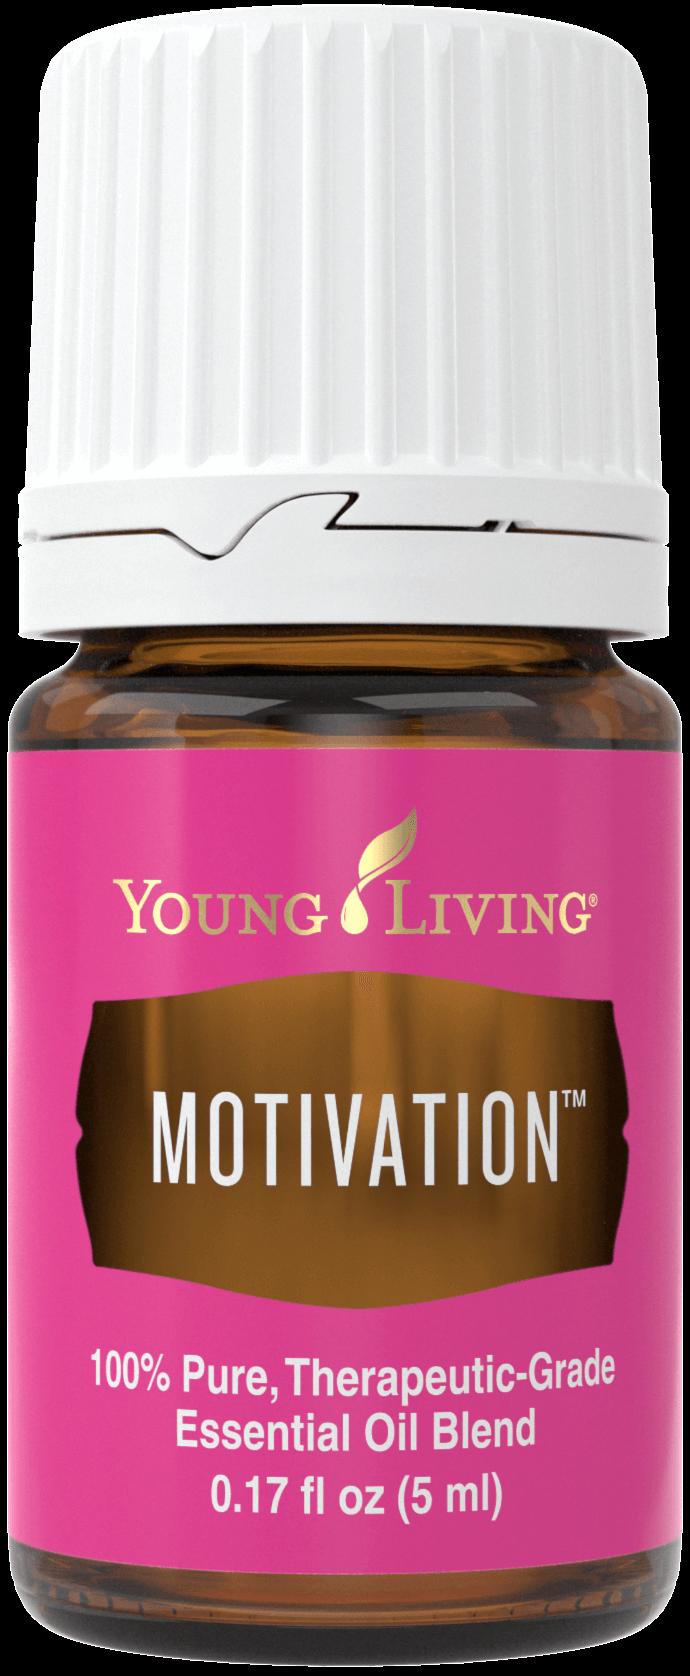 Motivation 5ml